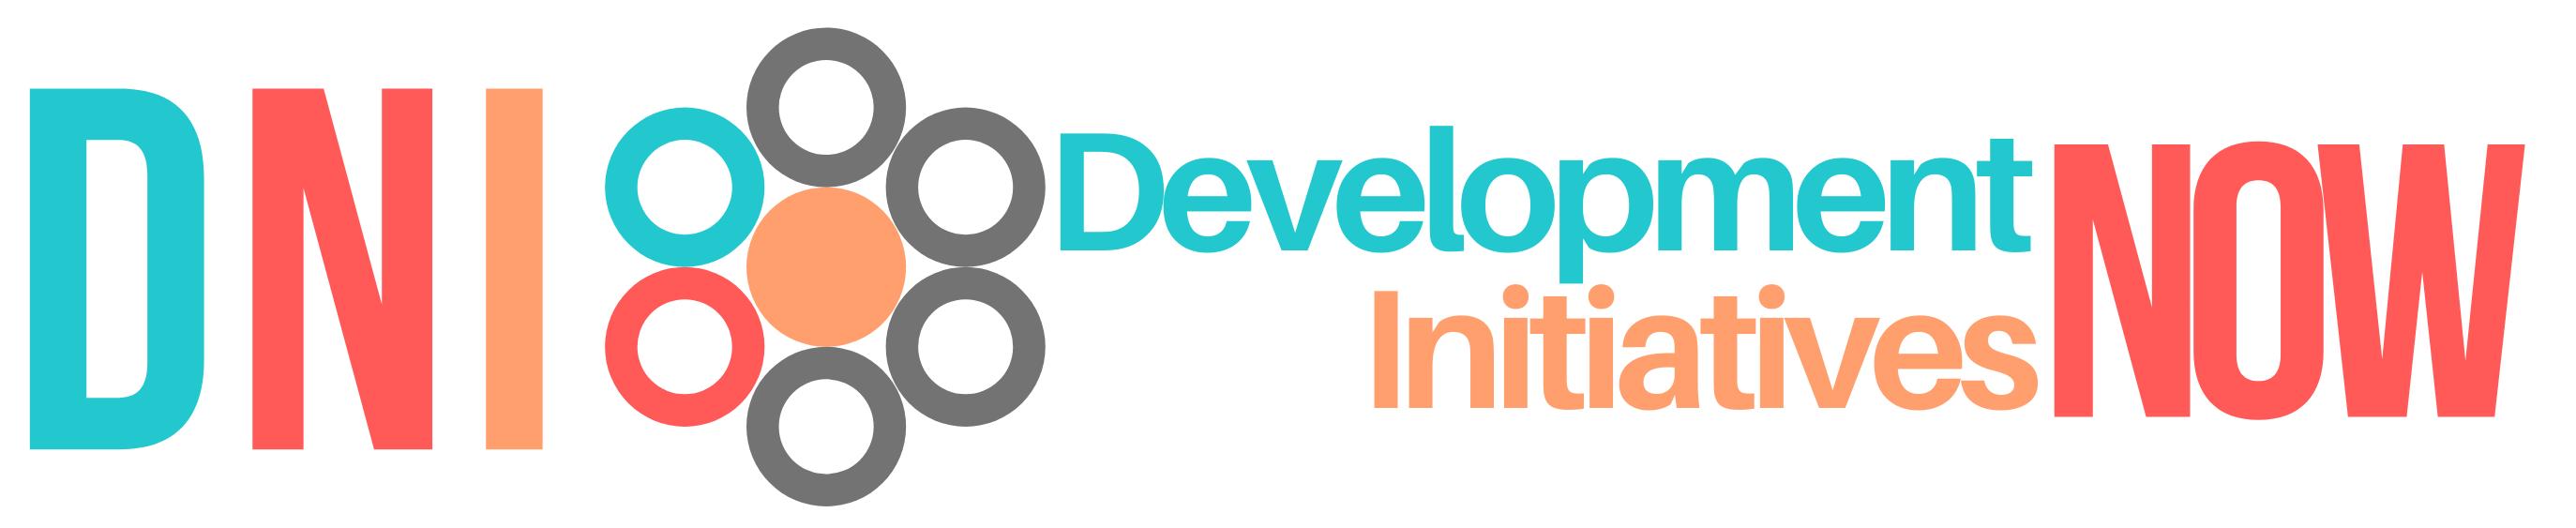 Development Now Initiatives Corp